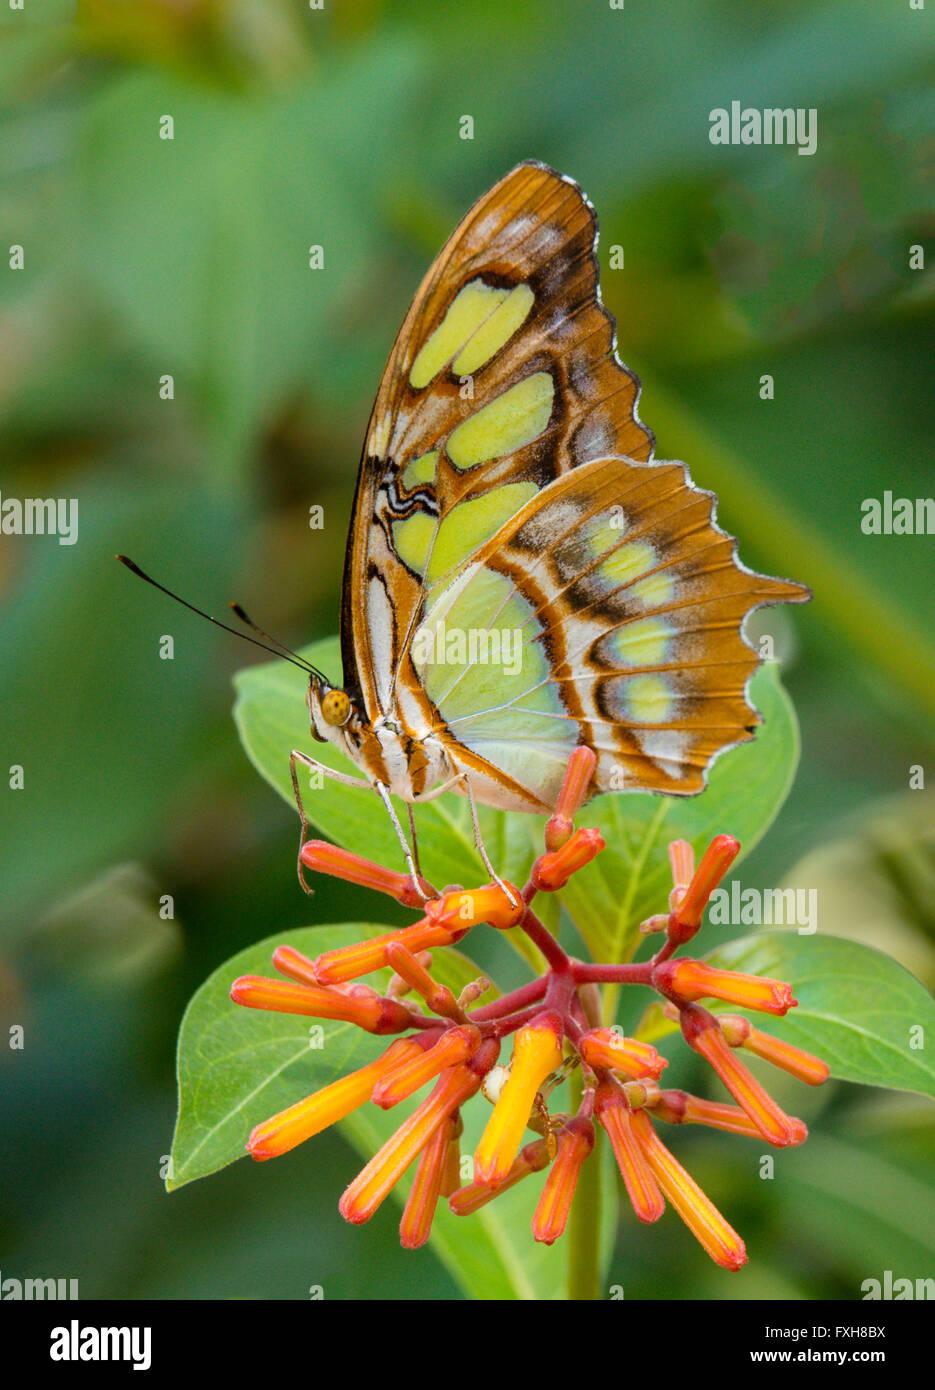 Malaquita Siproeta stelenes butterfly tomadas en fincas de mariposas en Fort Myers Flkorida Foto de stock